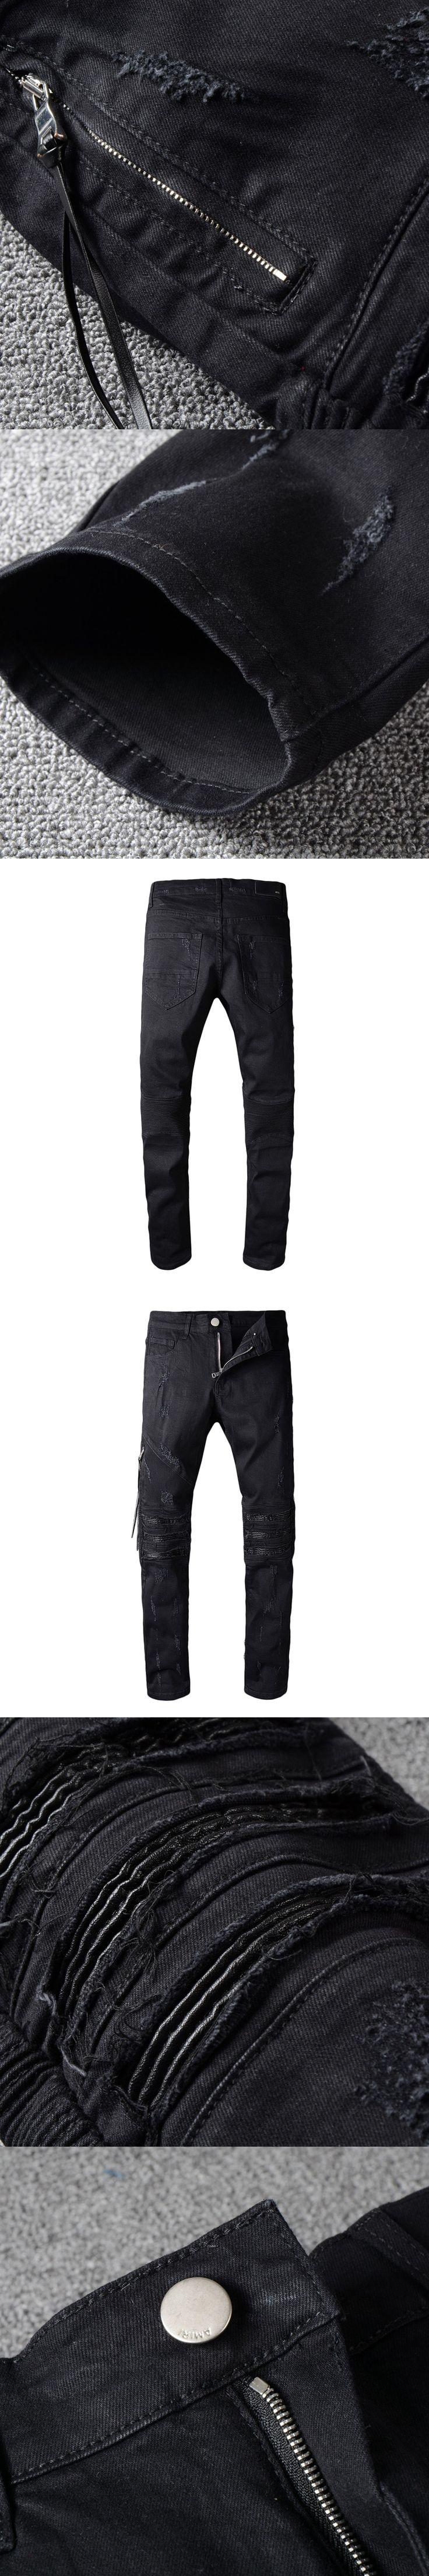 Hi-Q Hot Sale Biker Jeans Men Casual Black Denim Straight Design Pants Brand Clothing Jeans homme